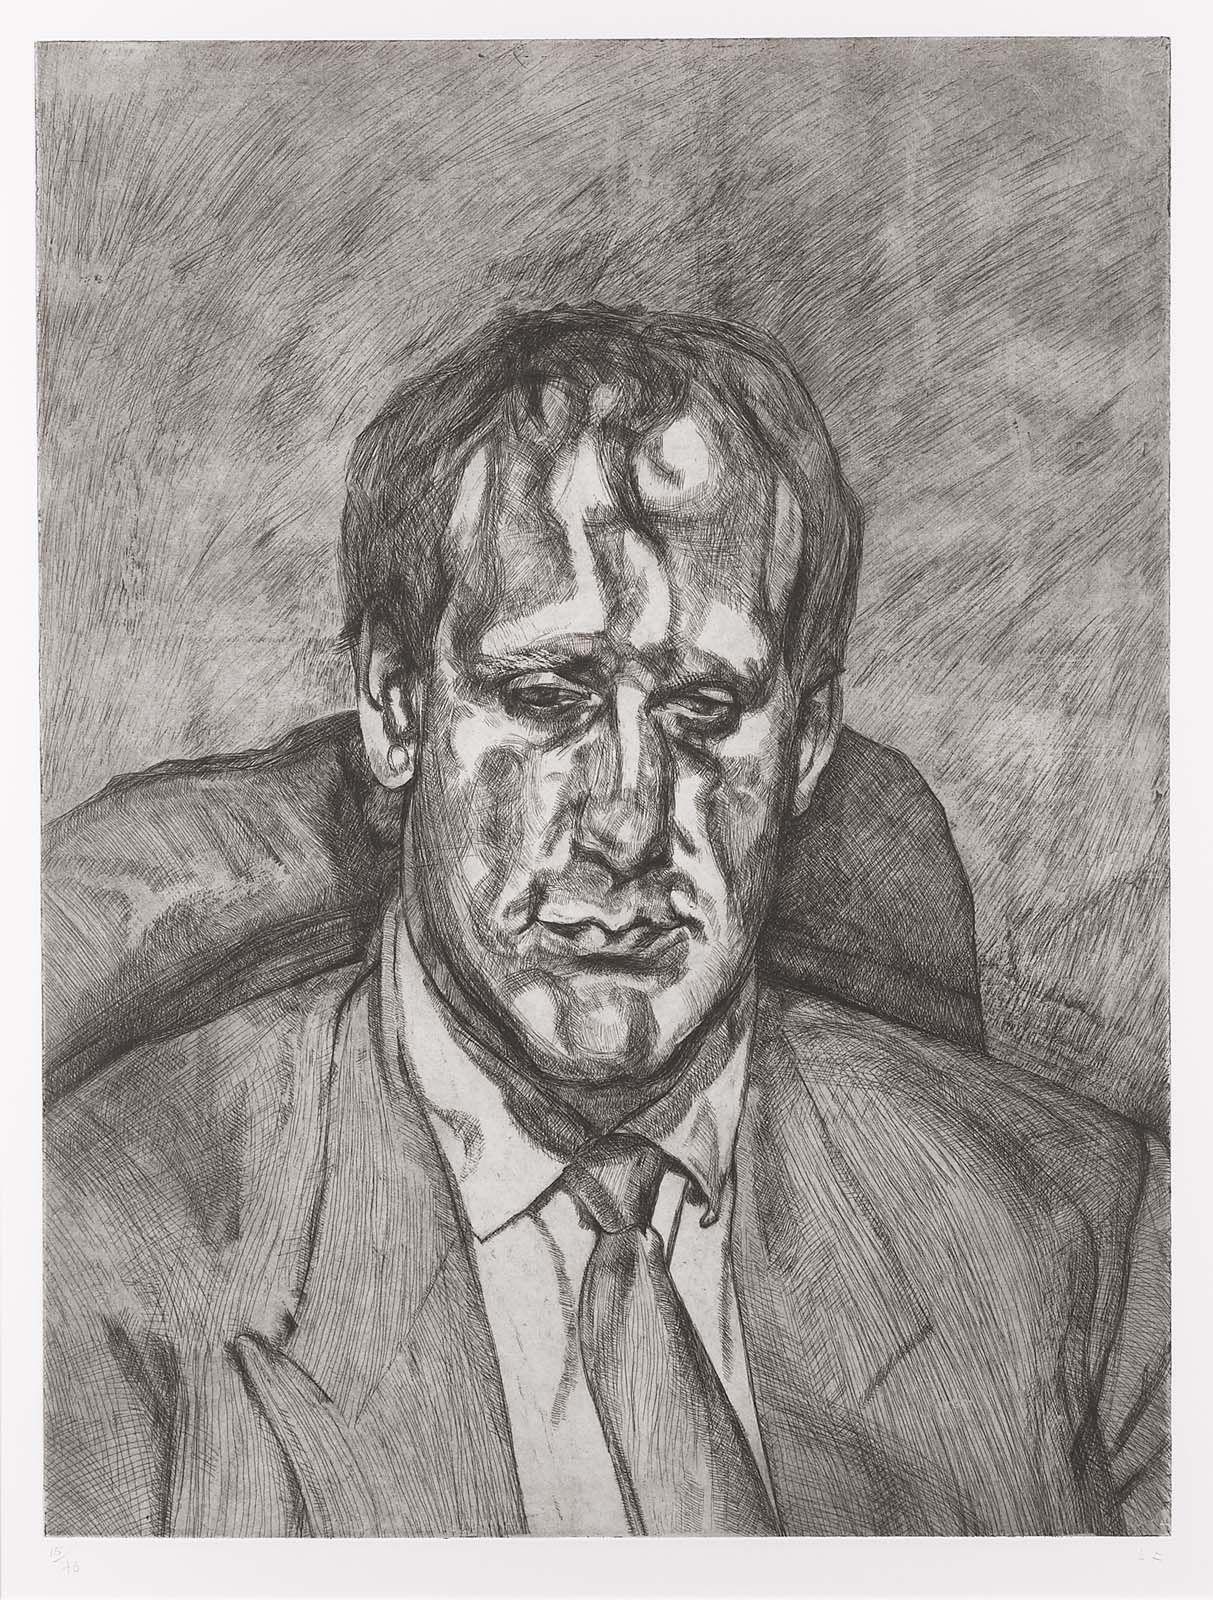 Head of an Irishman, Lucian Freud, 1999